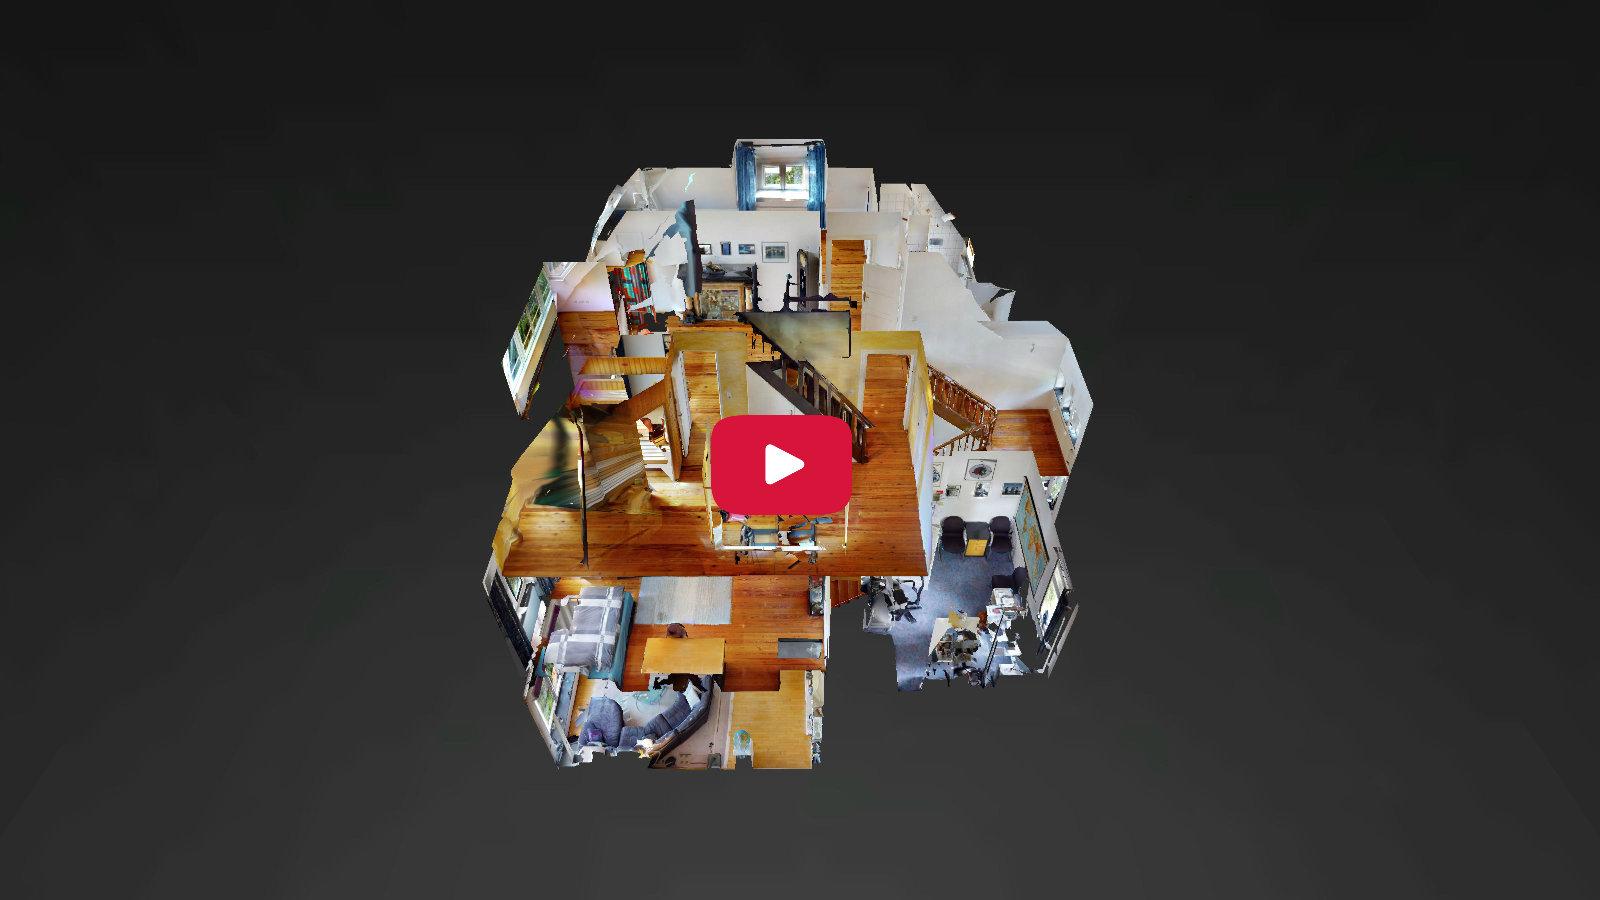 Image Video Matterport Thumbnail